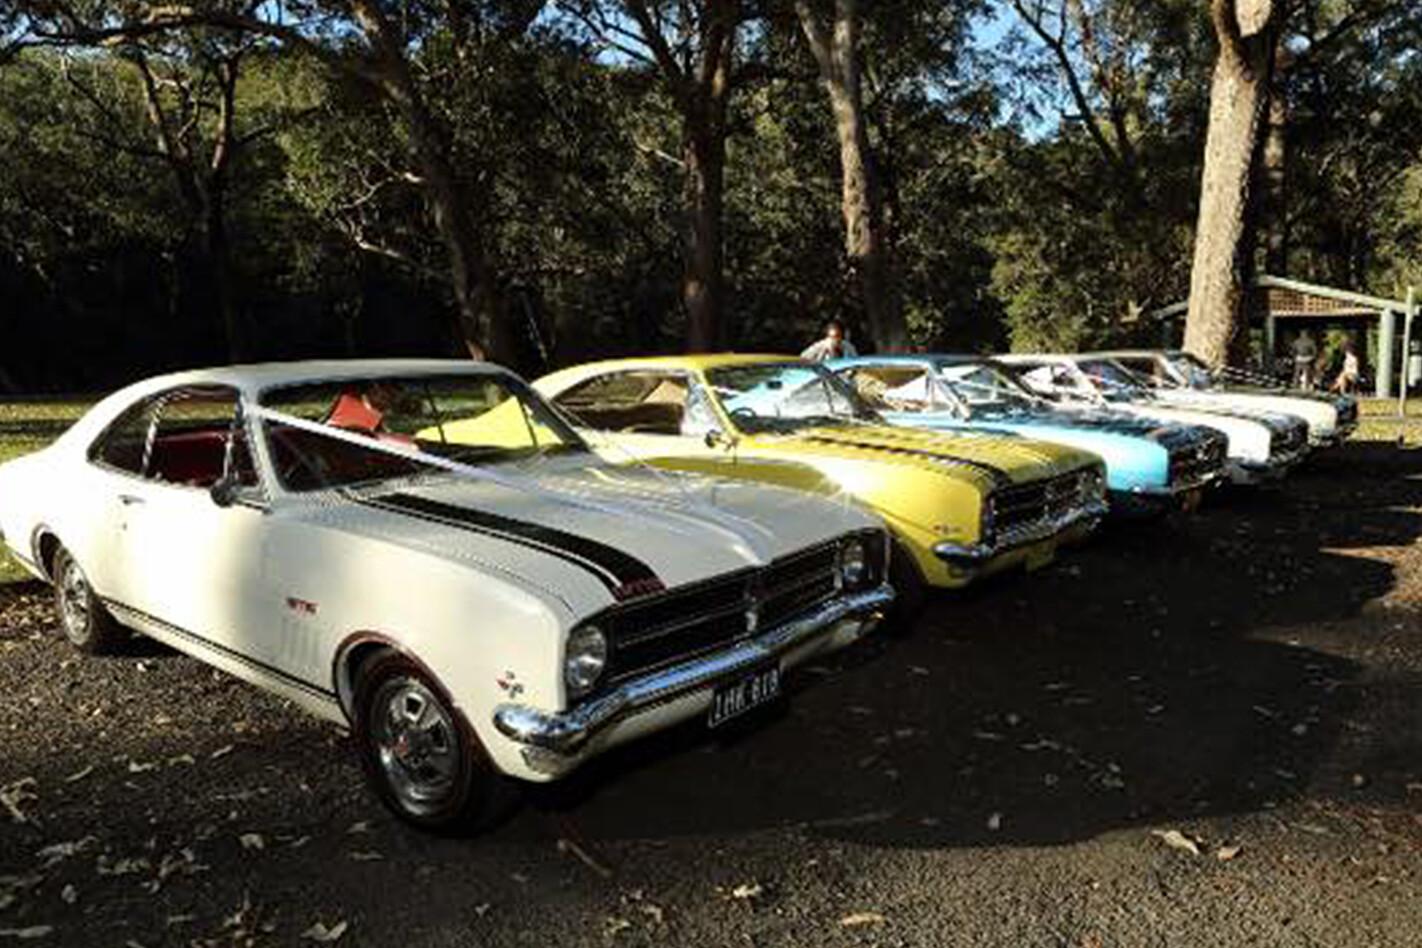 Shane Robinson's Holden Monaro wedding cars